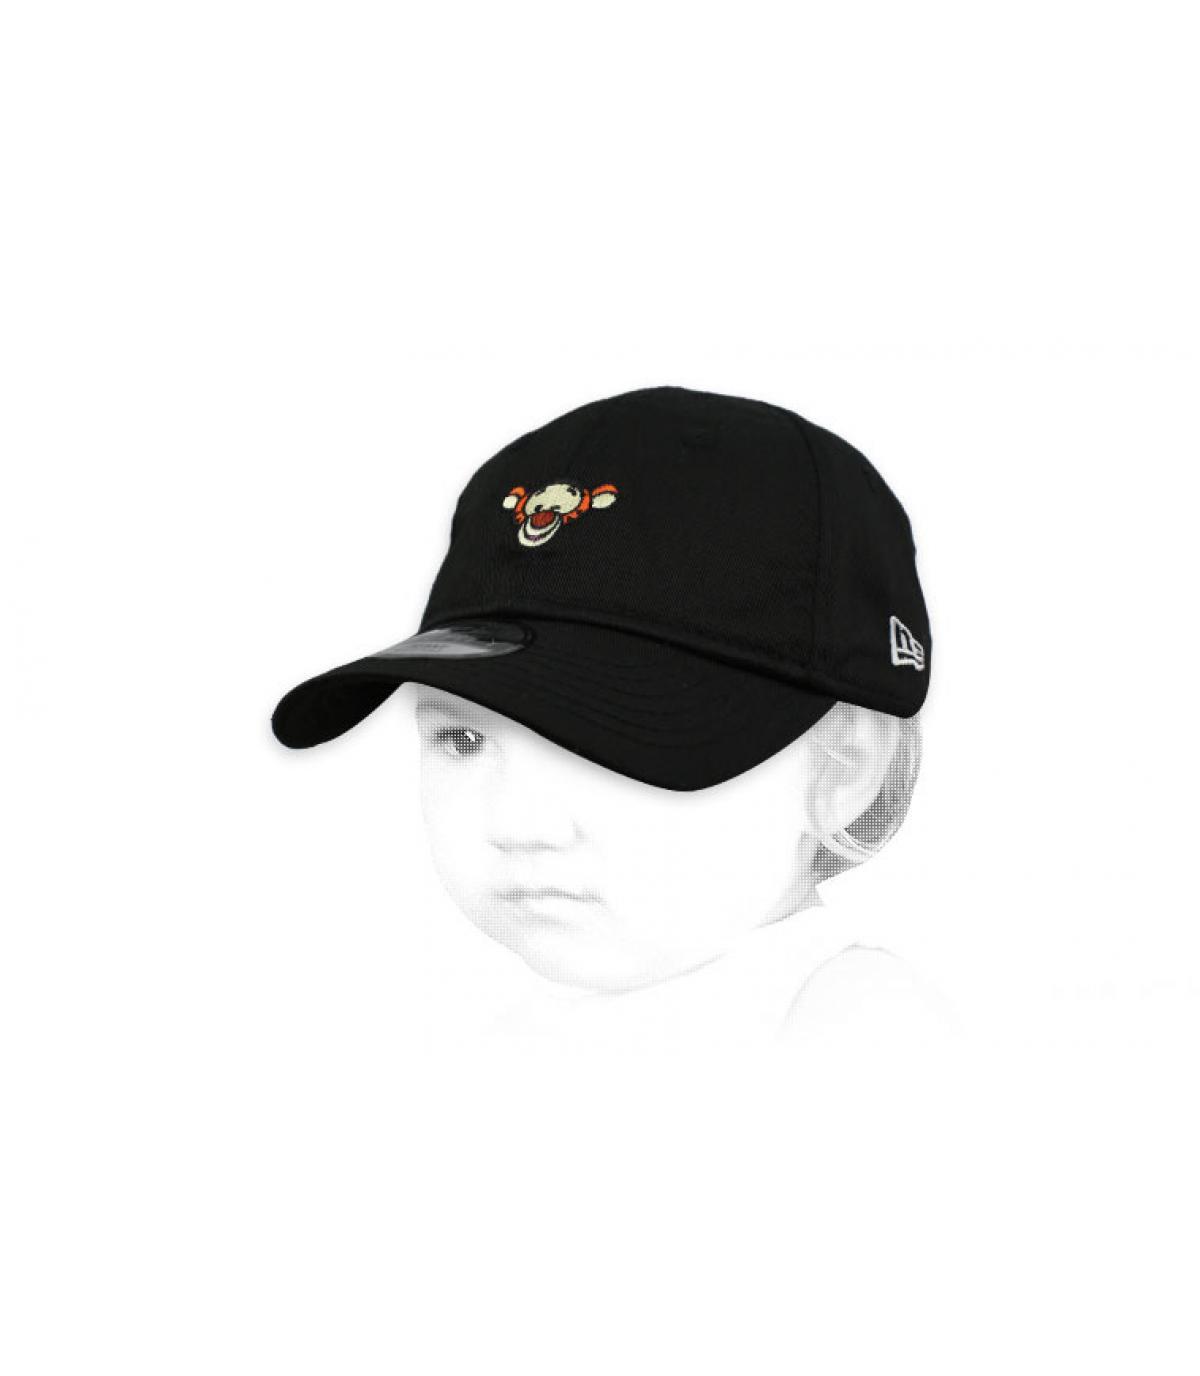 Tigger baby cap